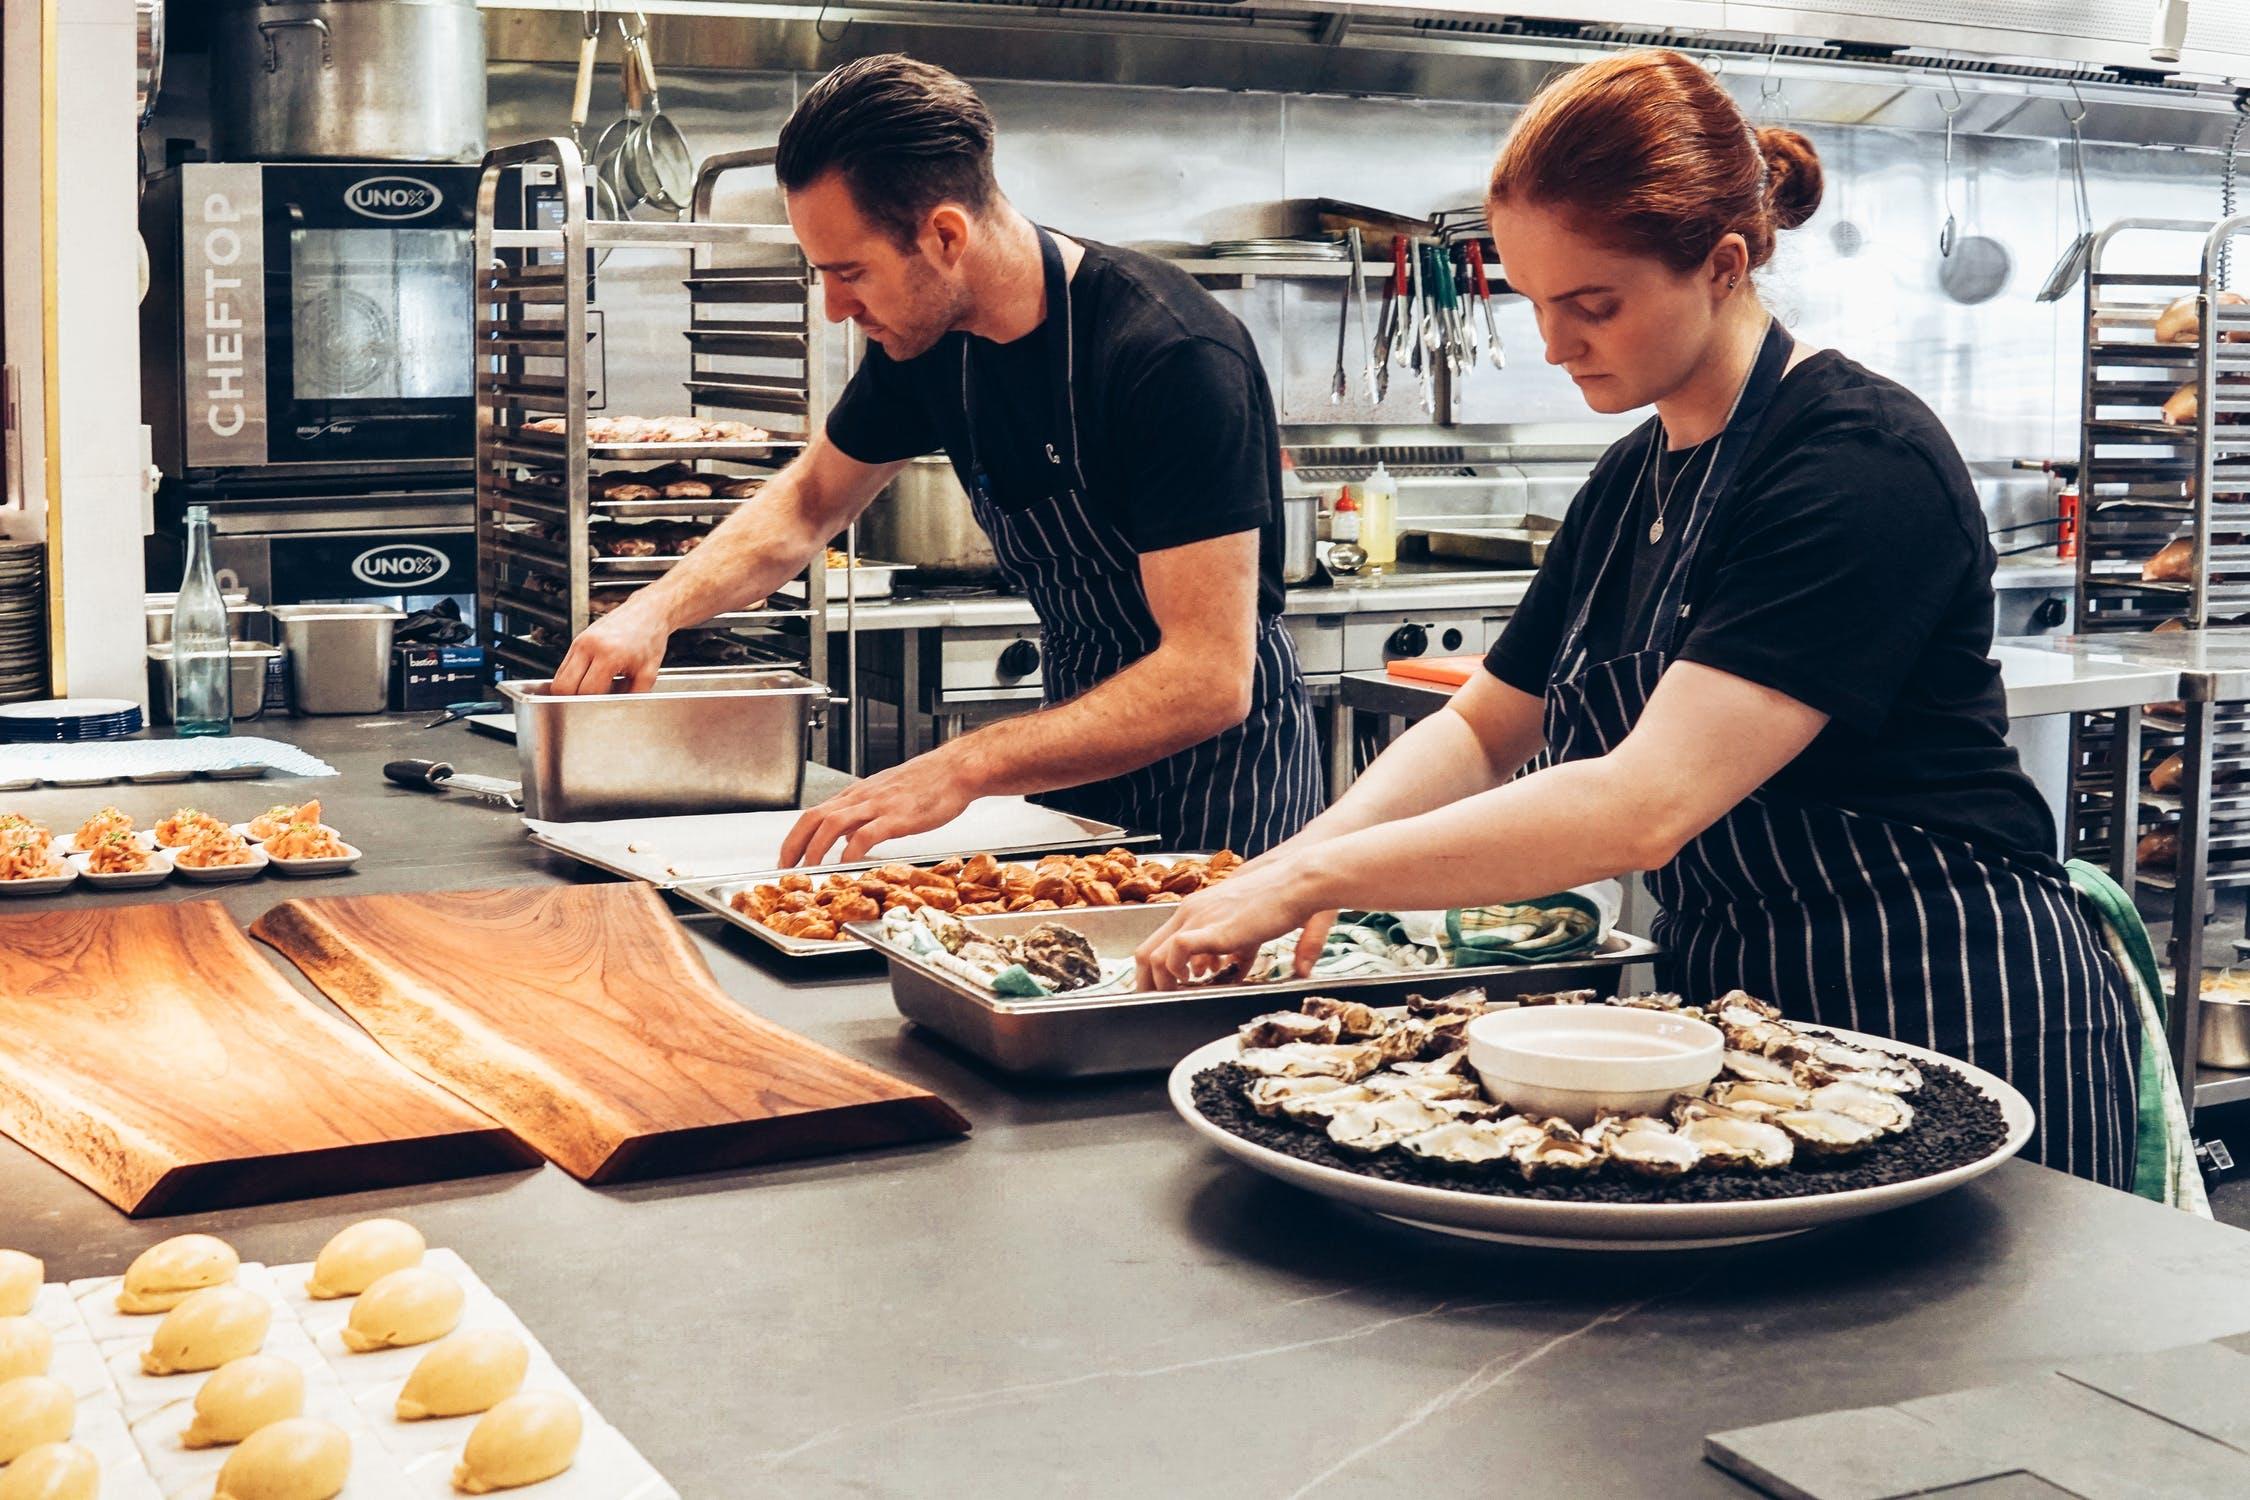 Ambitieuze kok Brasserie Lochristi